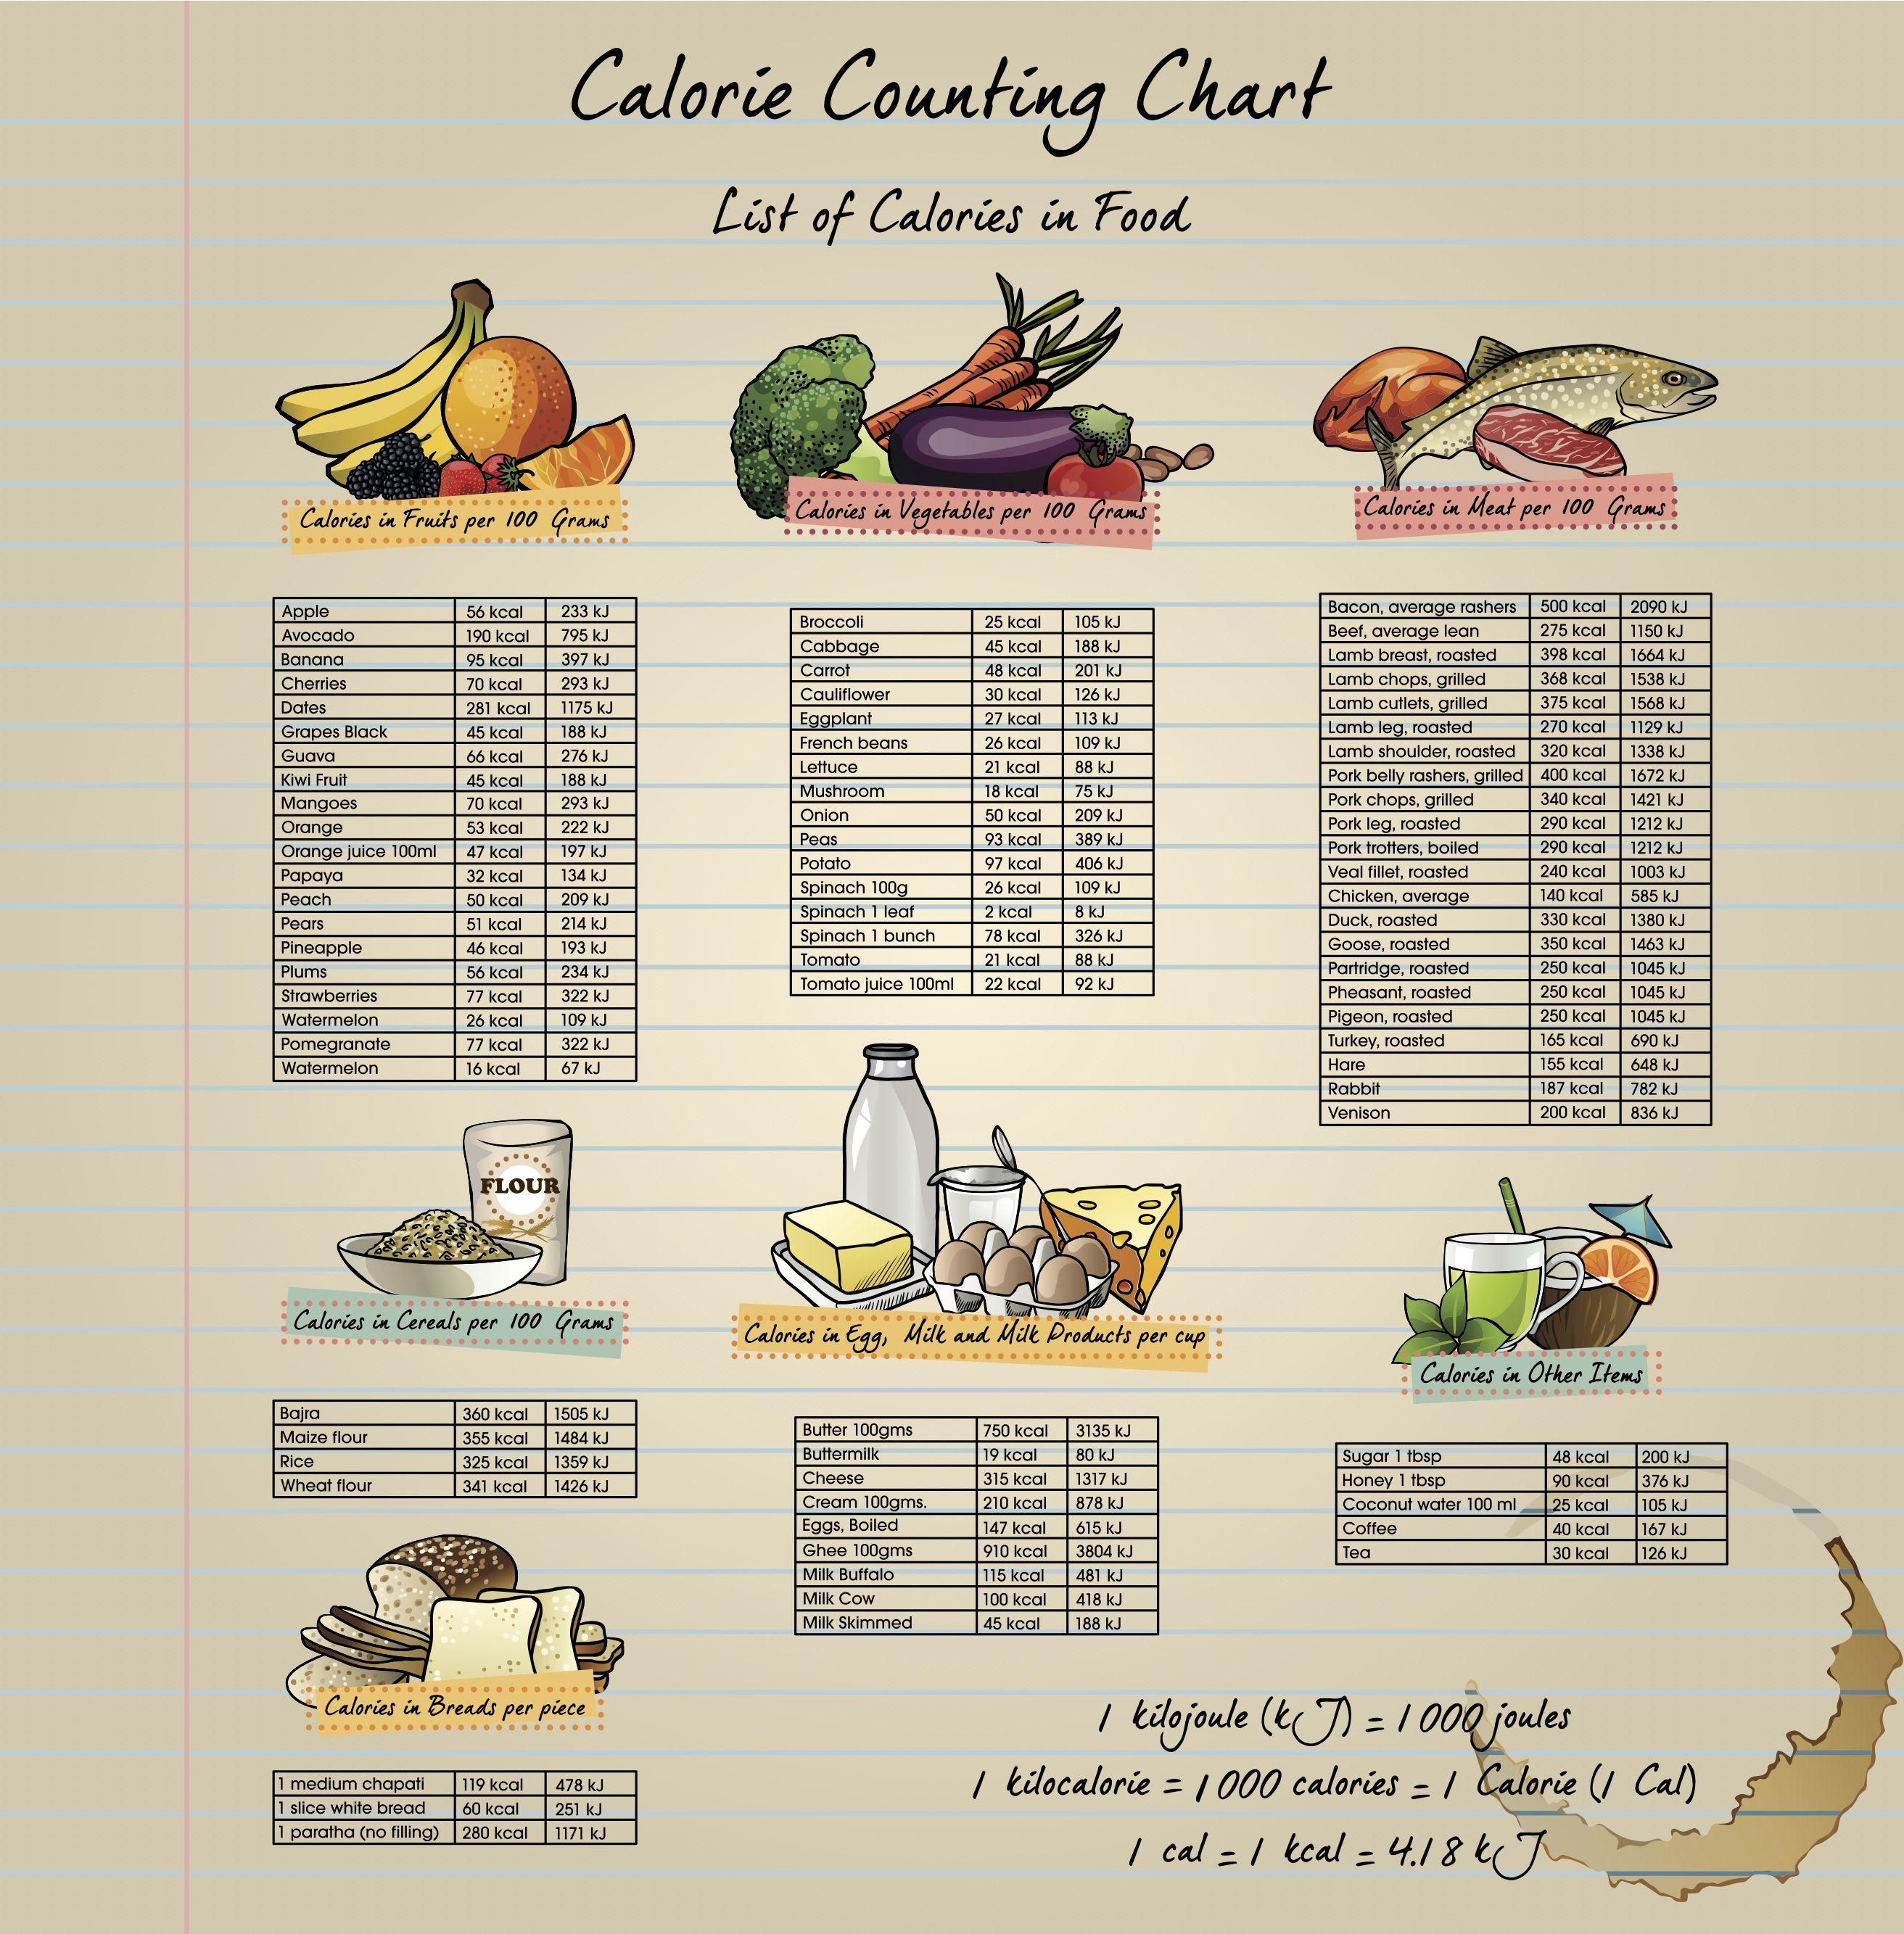 calorie counter chart google search calorie counts healthy